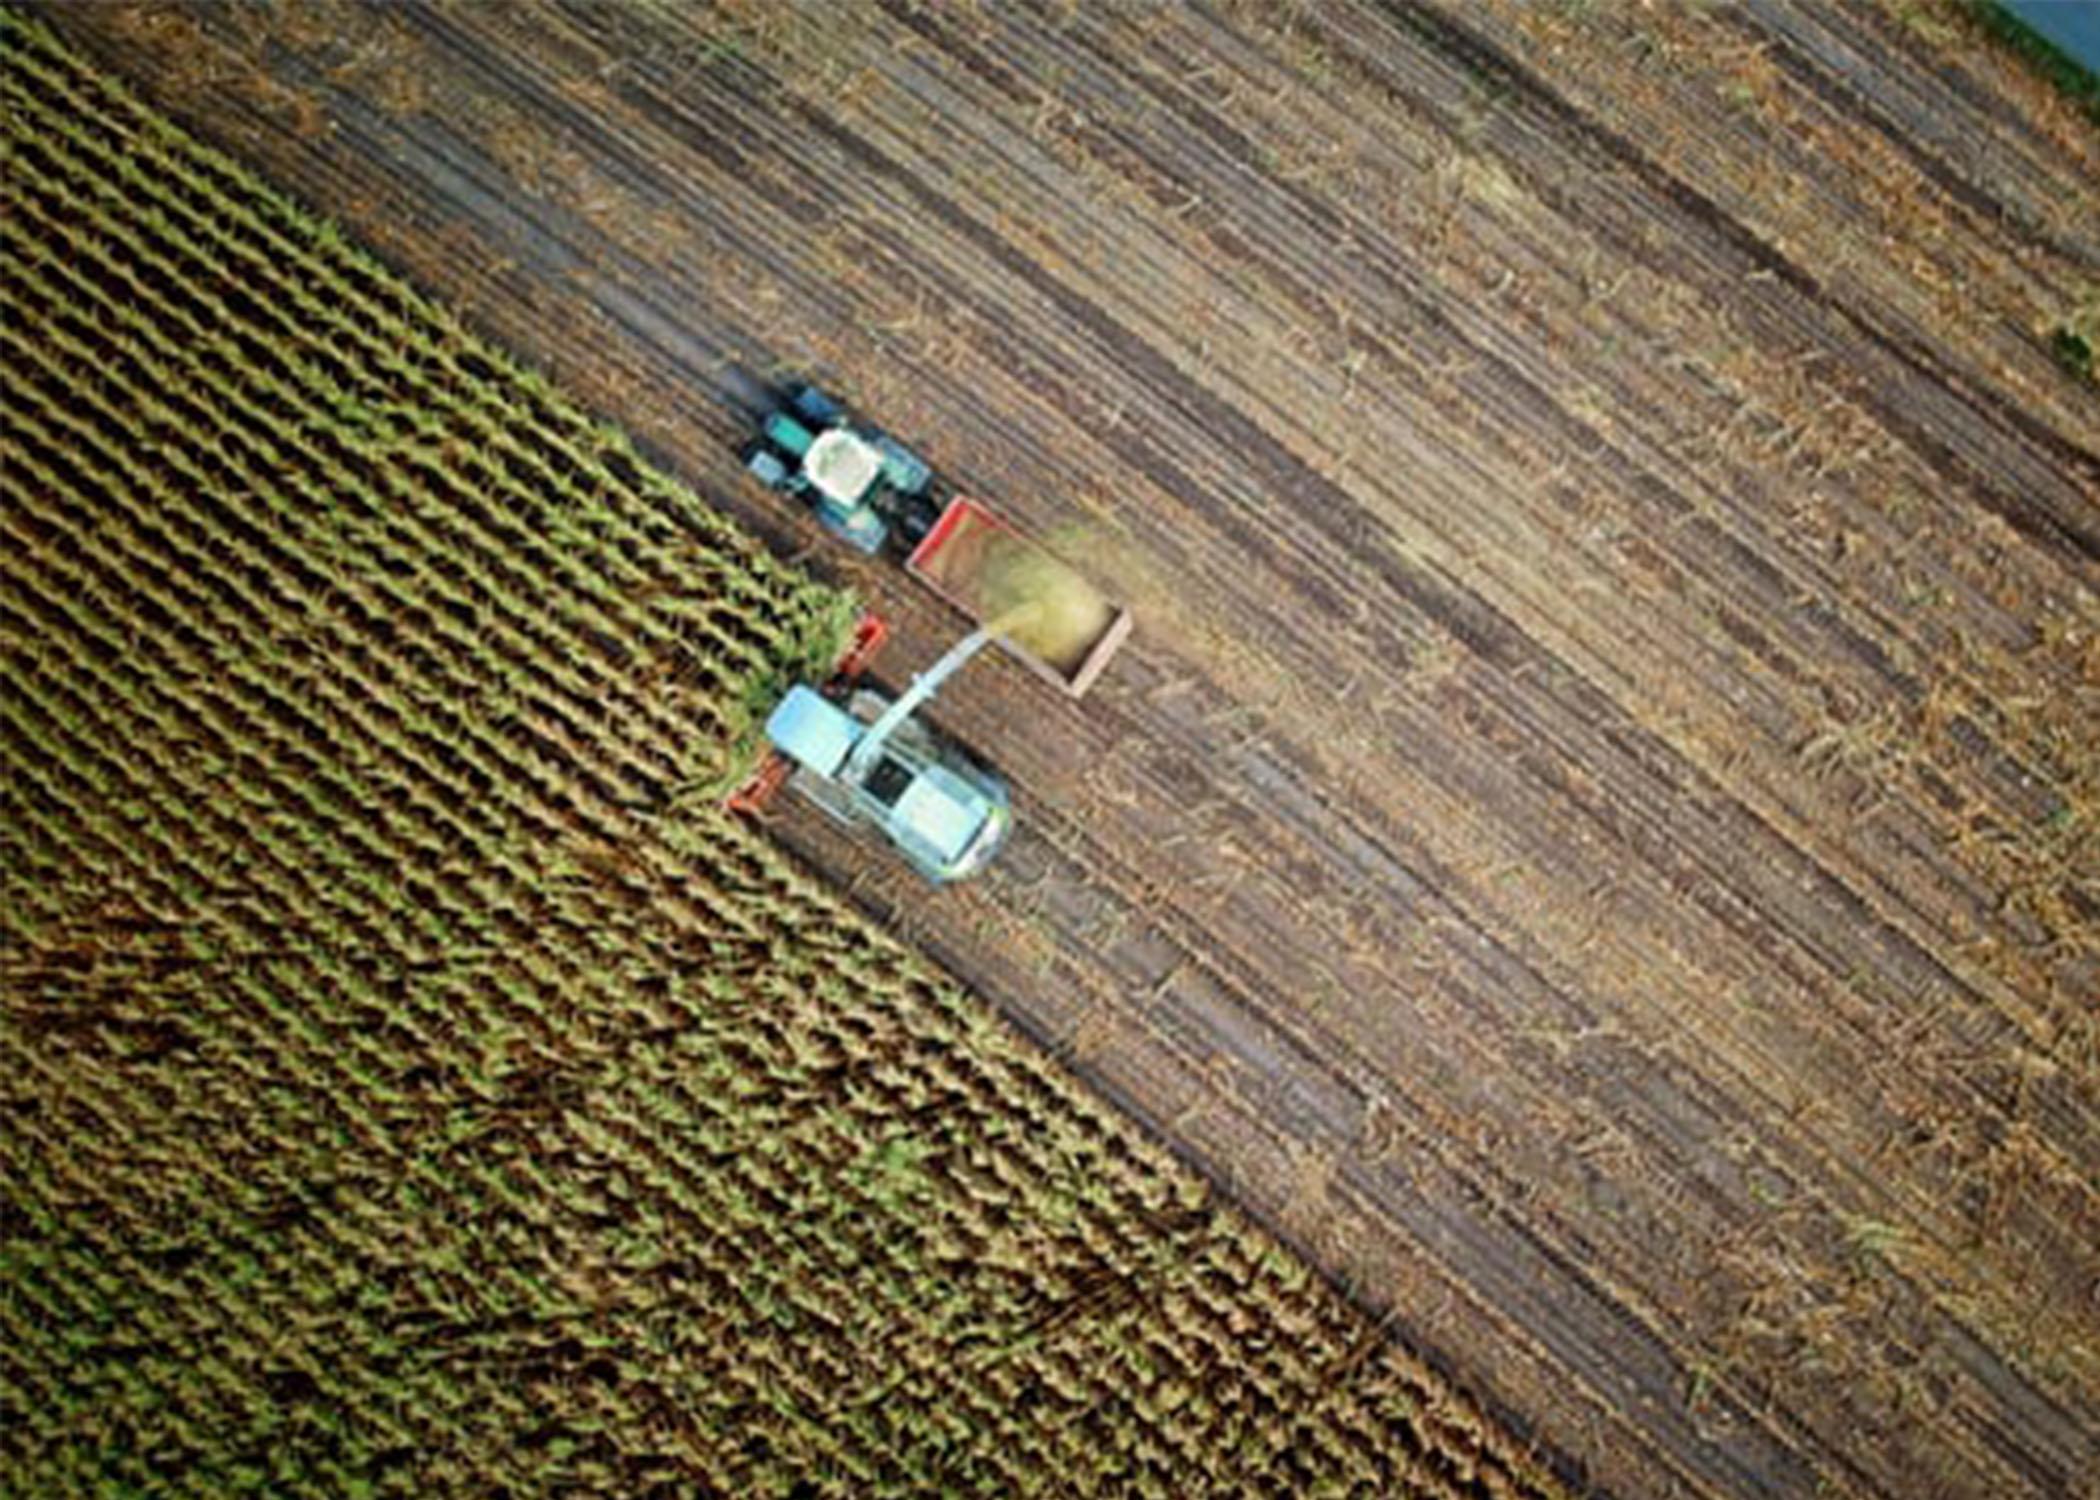 Ariel photo of two tractors on farmland.